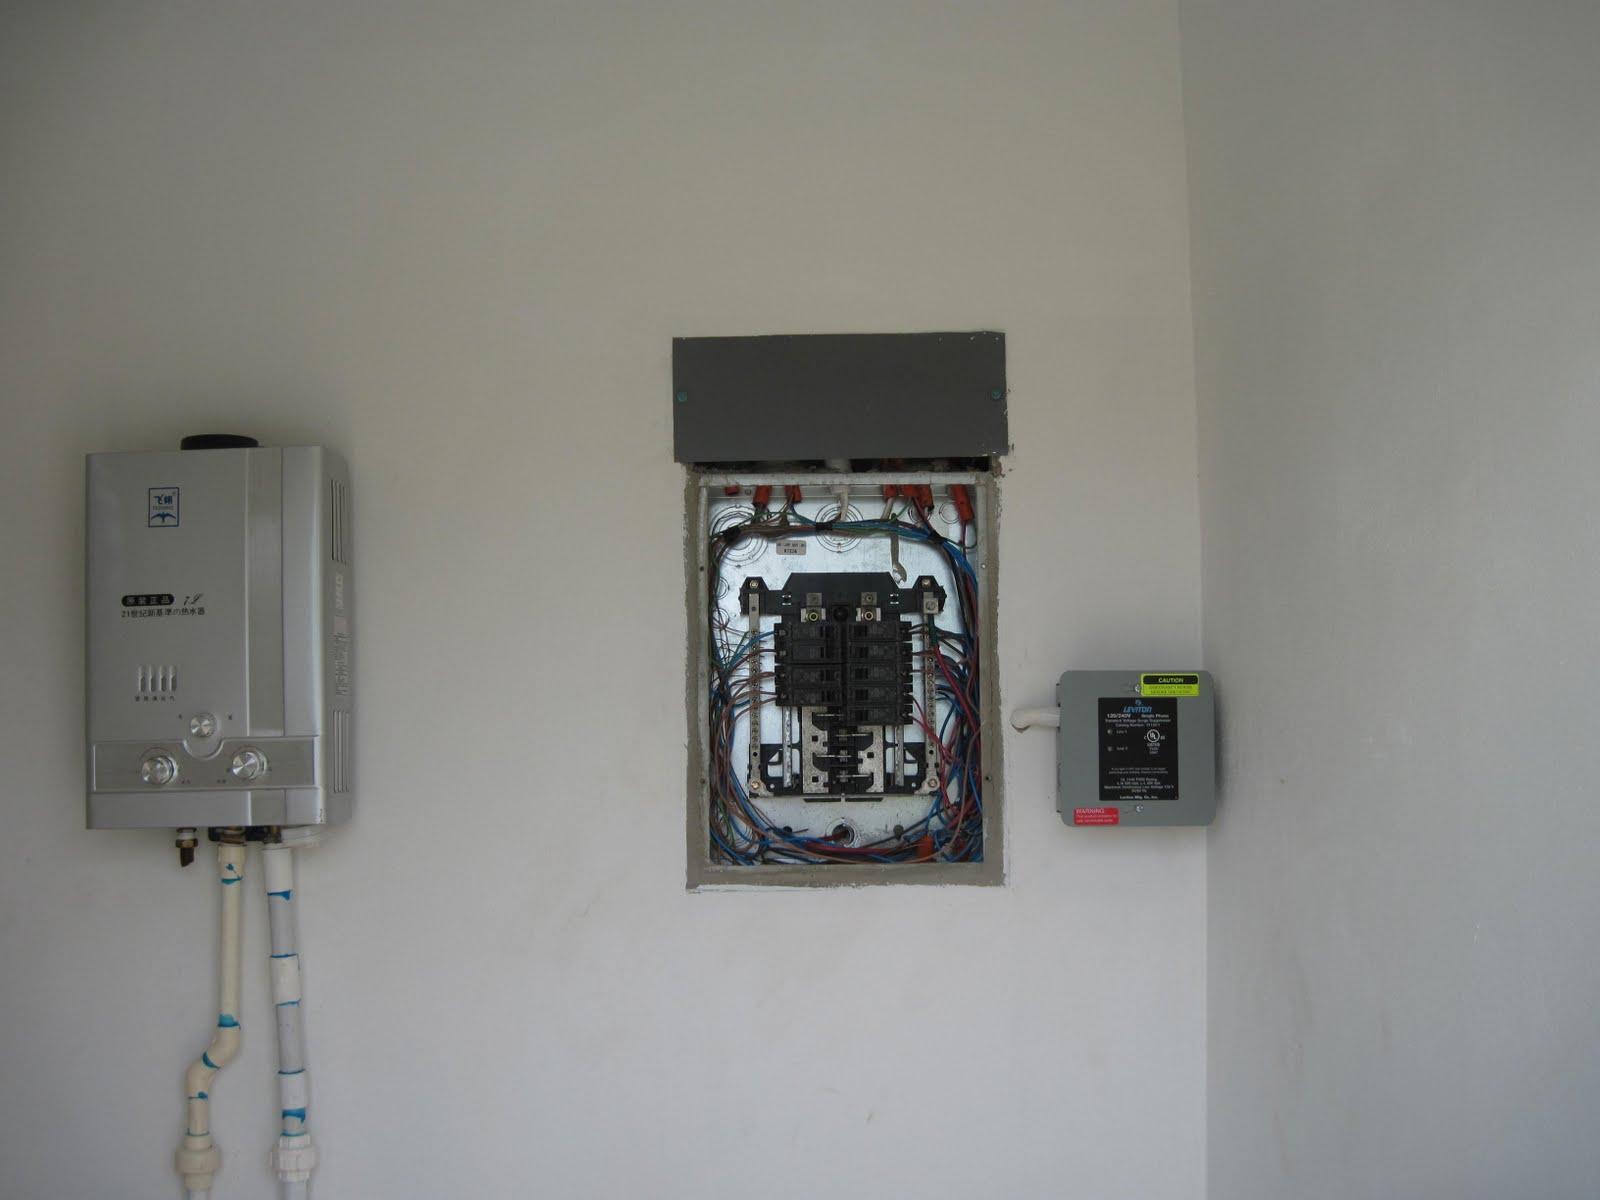 Water Heater, Breaker Box Whole House Surge Suppressor